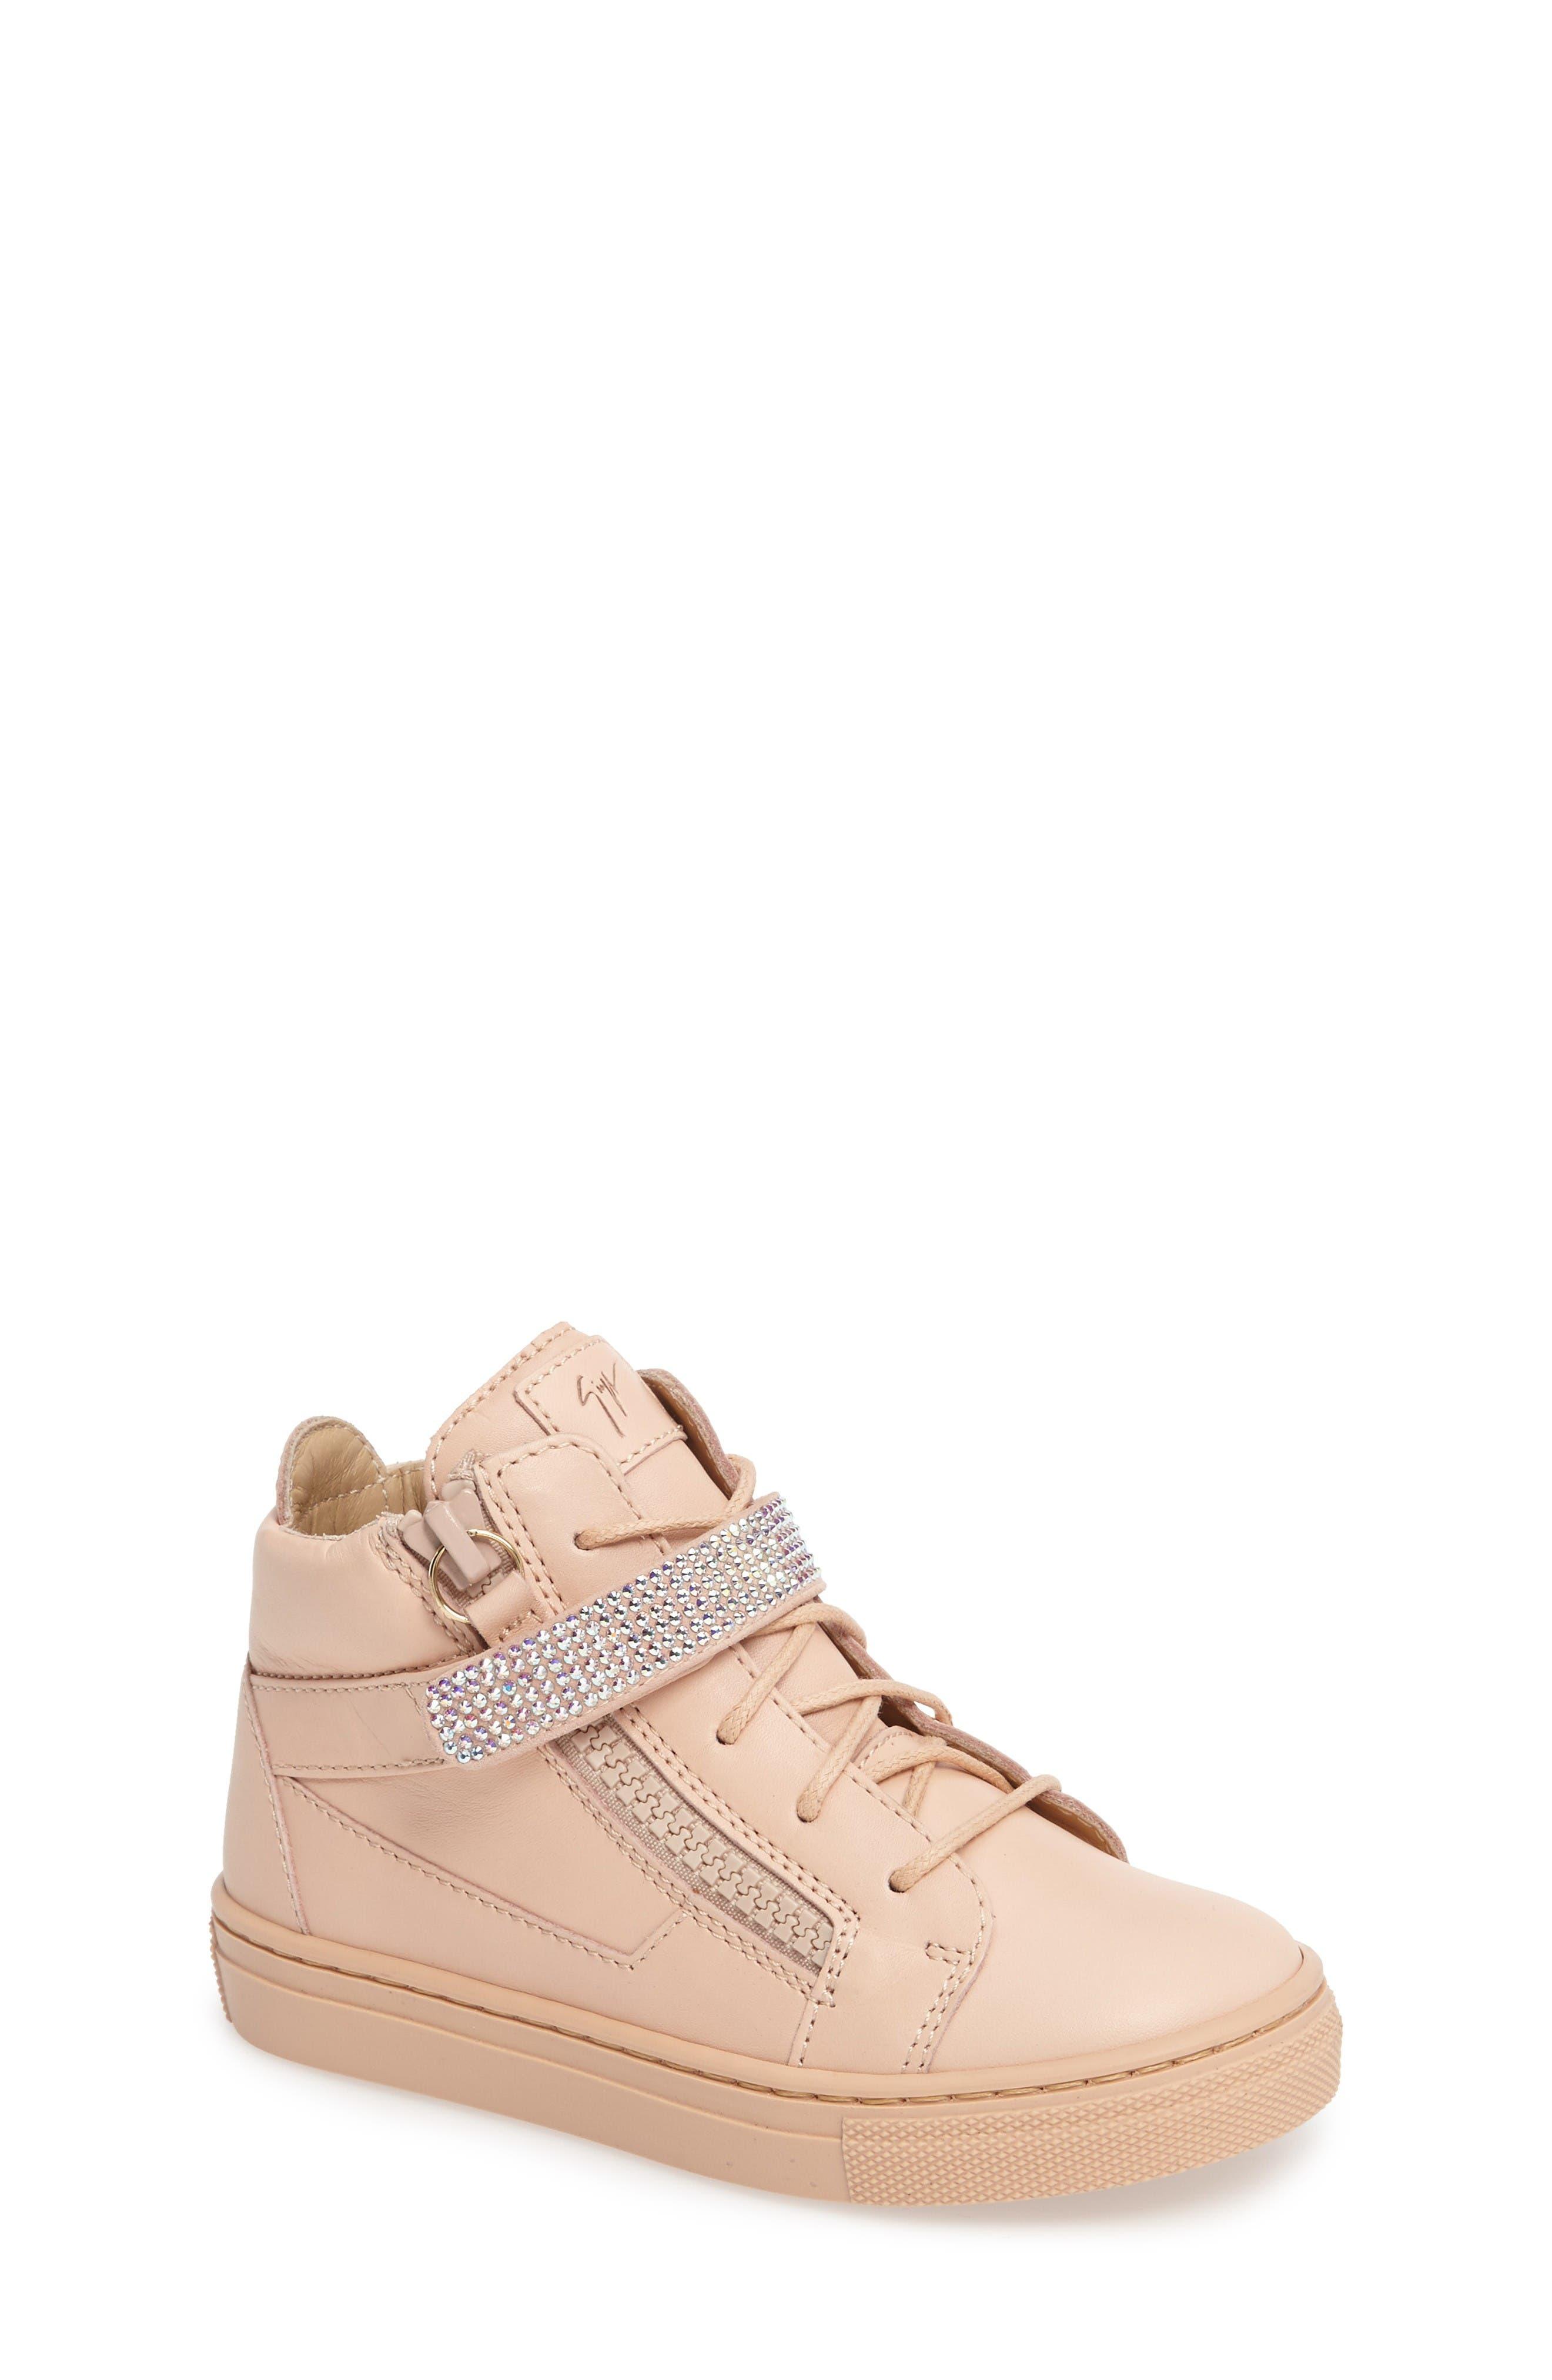 GIUSEPPE ZANOTTI Swarovski Crystal Embellished High Top Sneaker